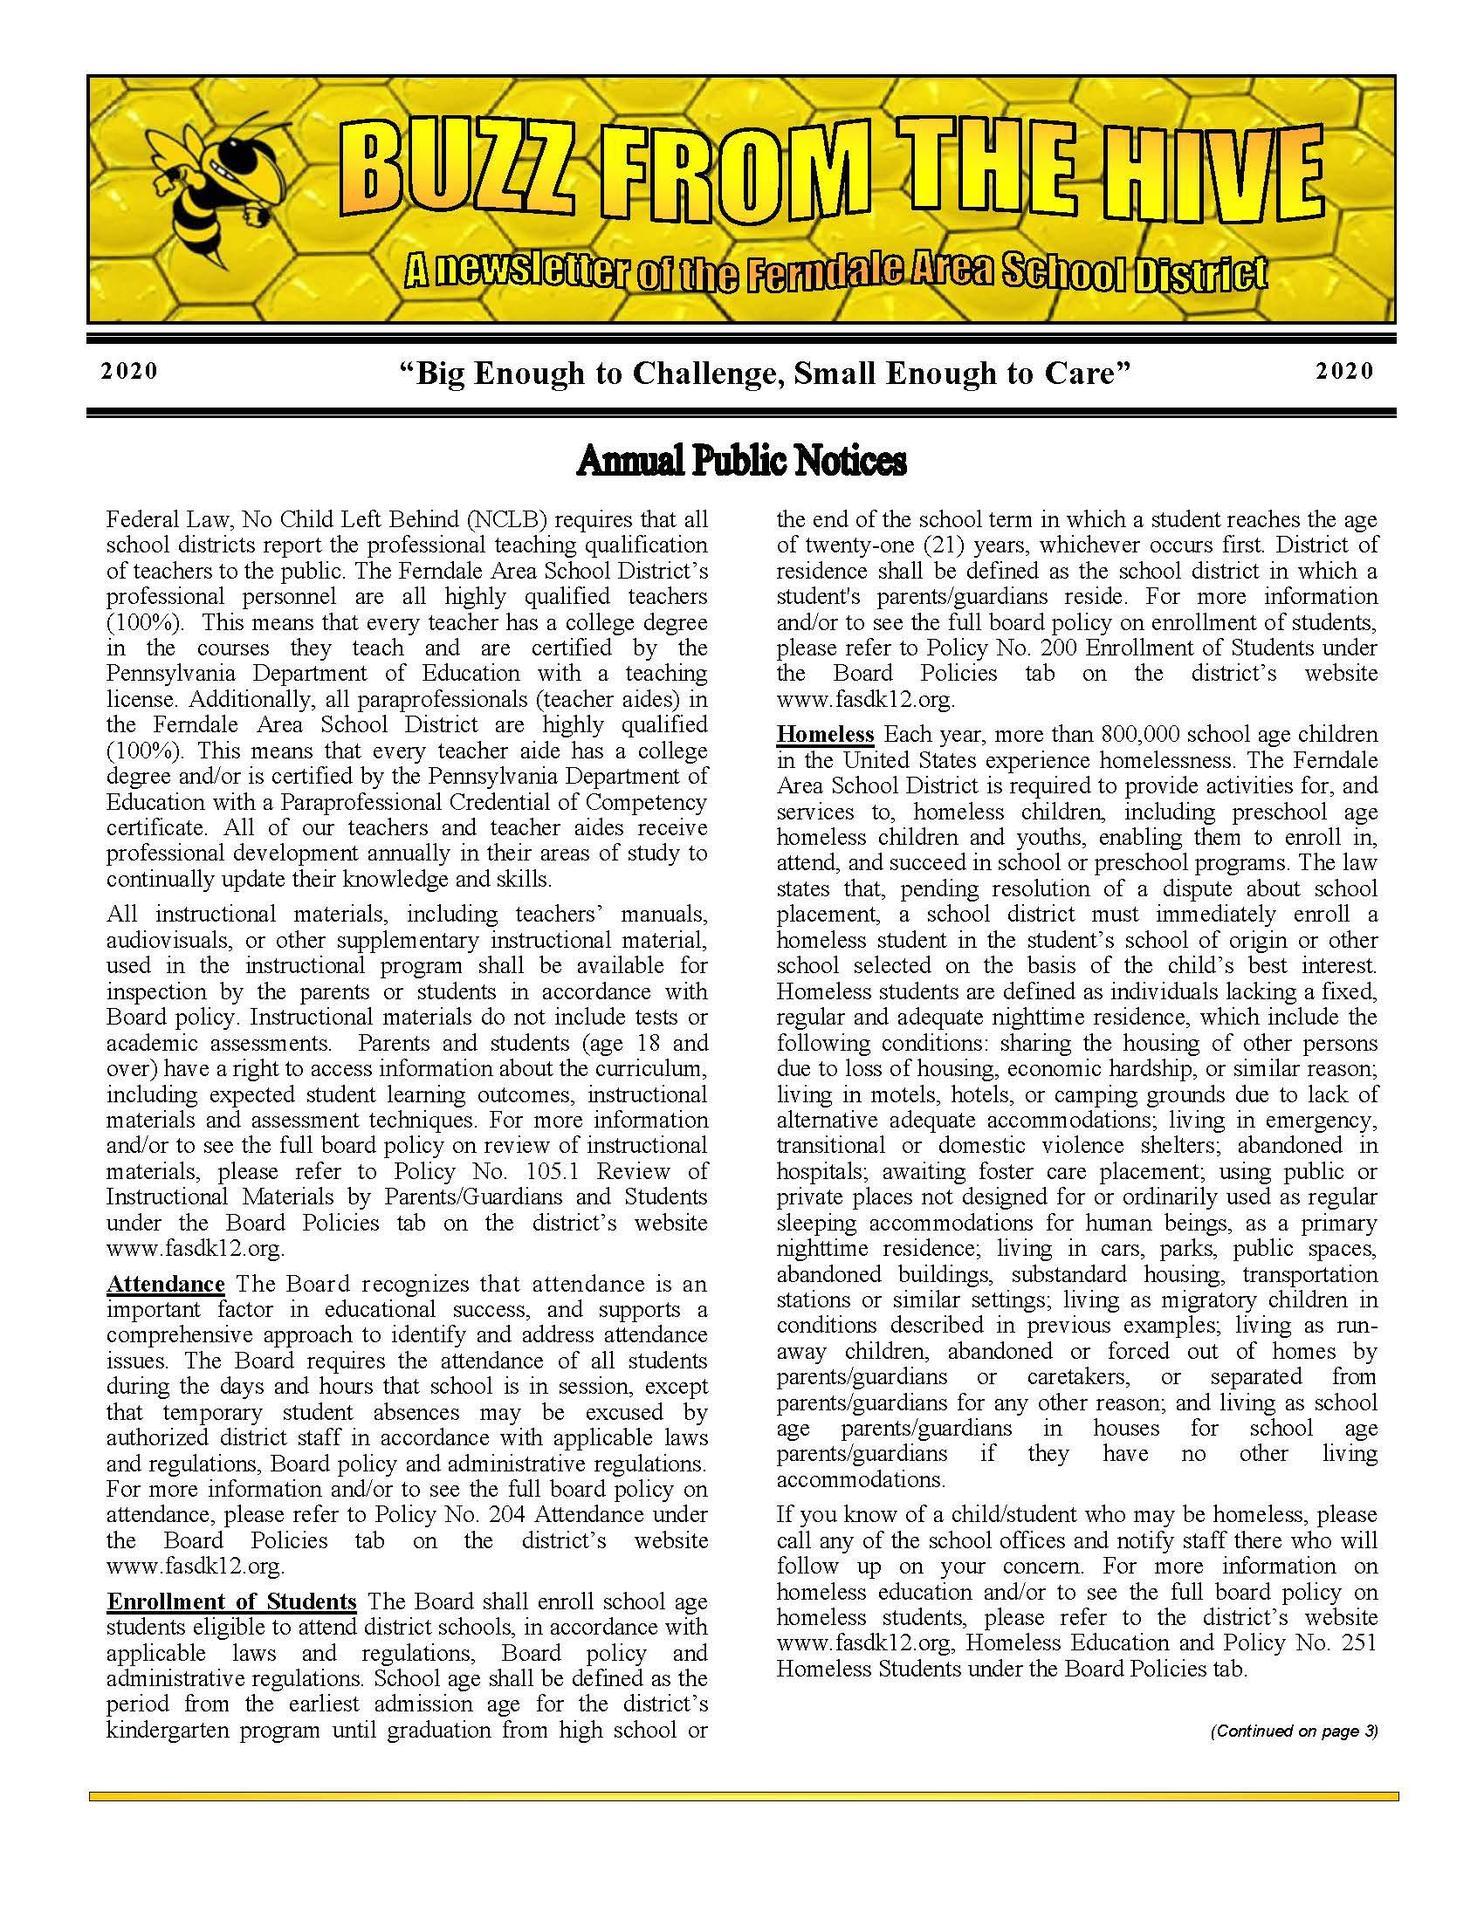 2020-2021 Annual Pubic Notices